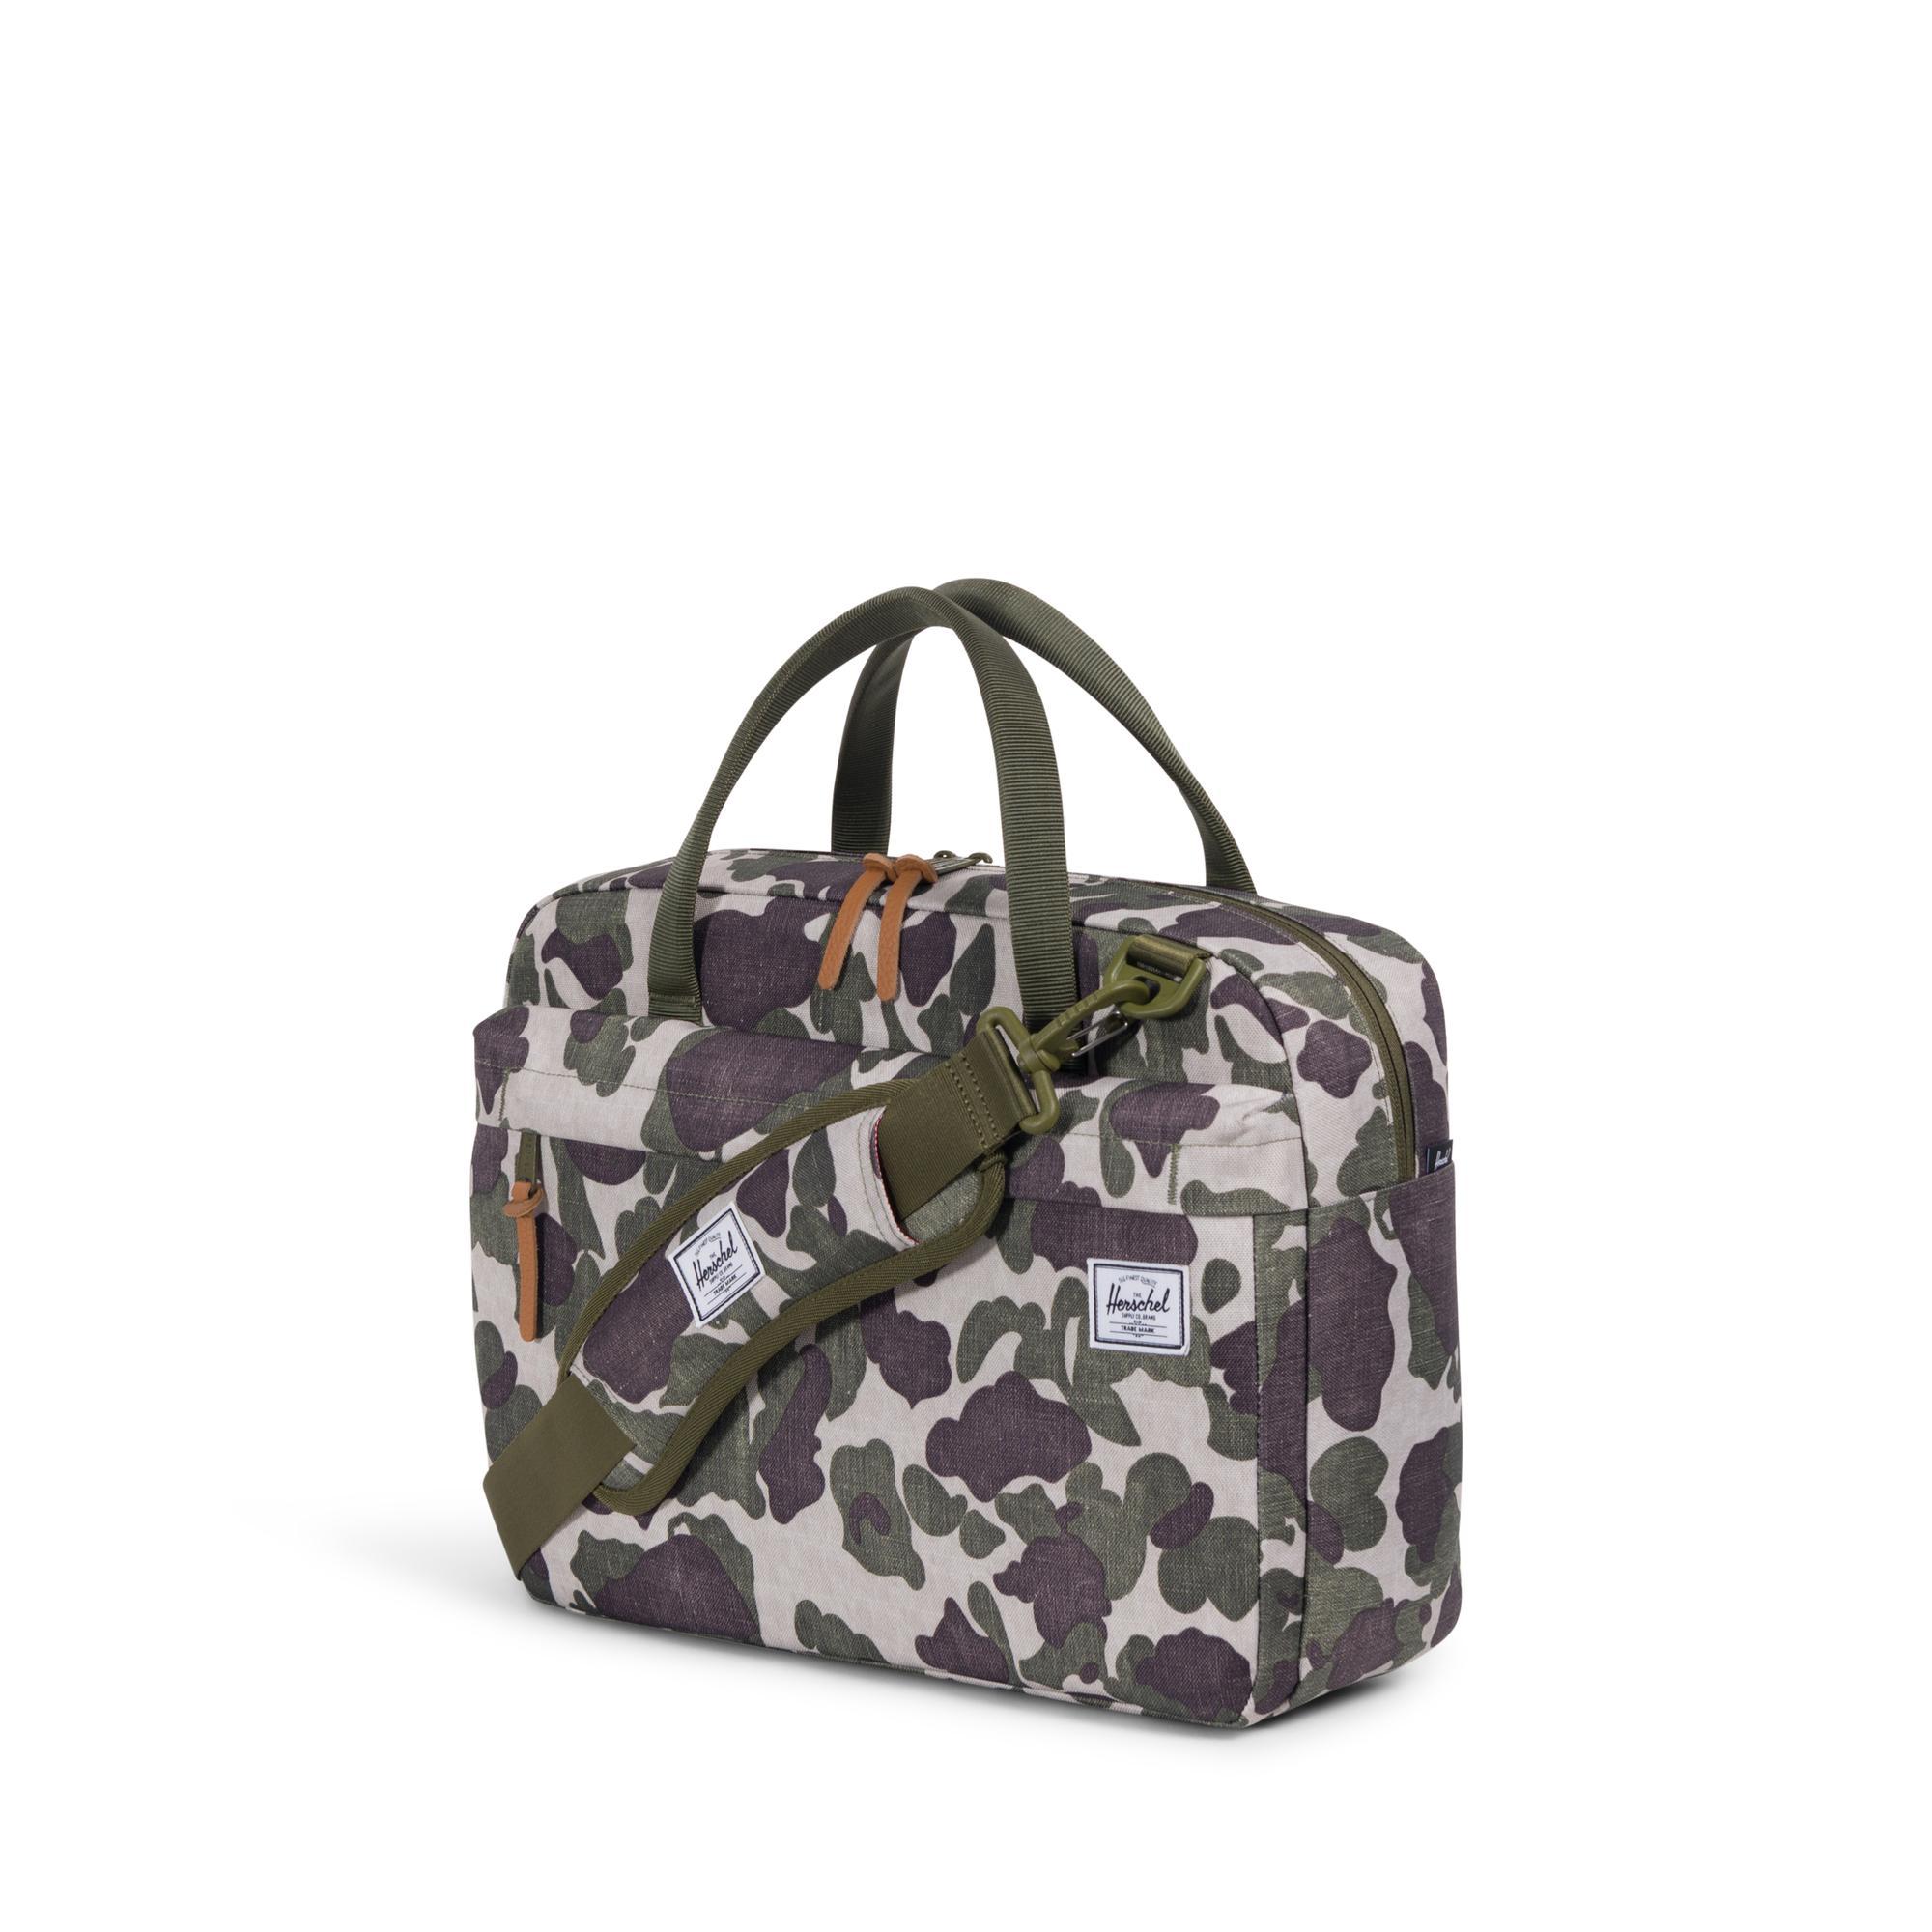 99880bafab5 Men s Messenger Bags   Messengers   Herschel Supply Company